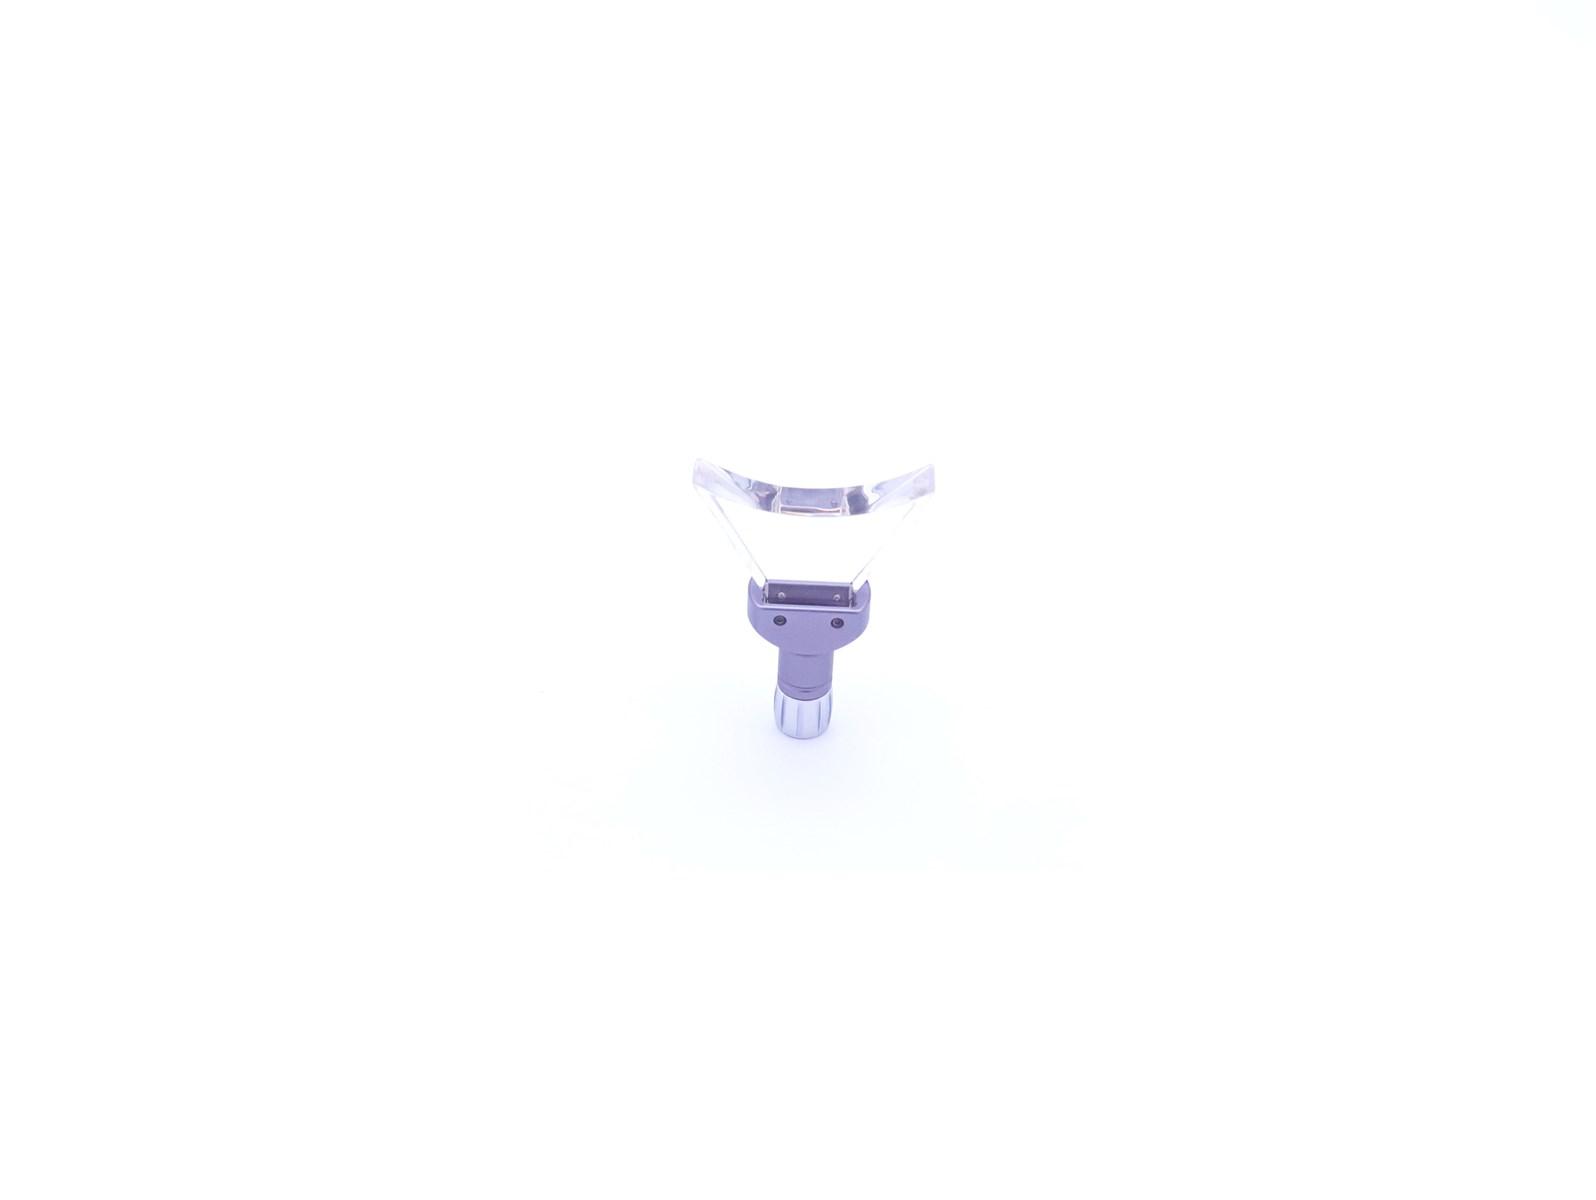 dental bleaching teeth whitening diode laser 980nm beauty equipment